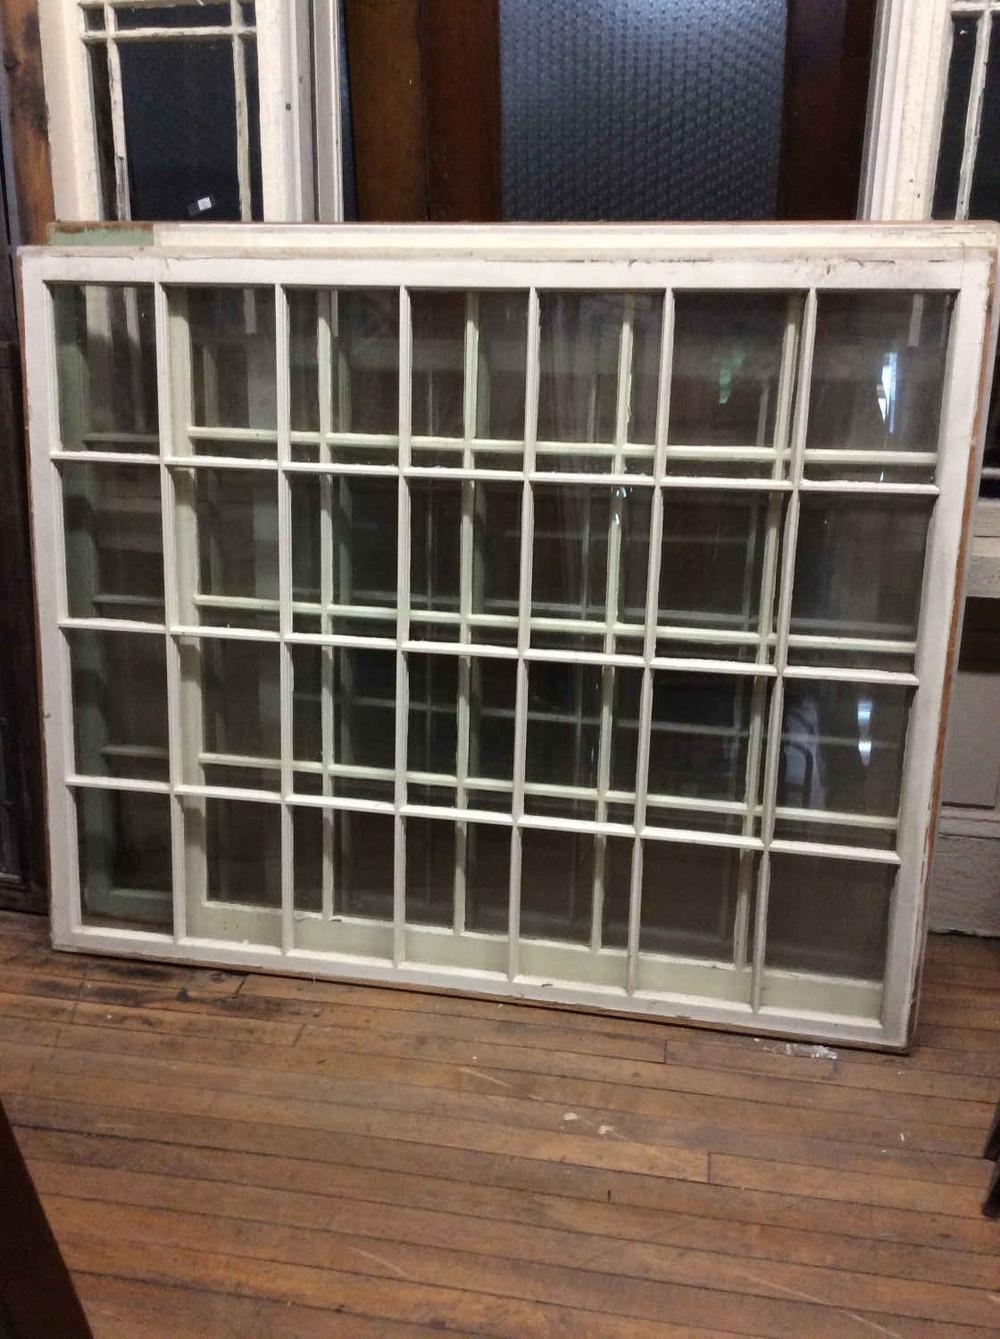 28-Pane Picture Window